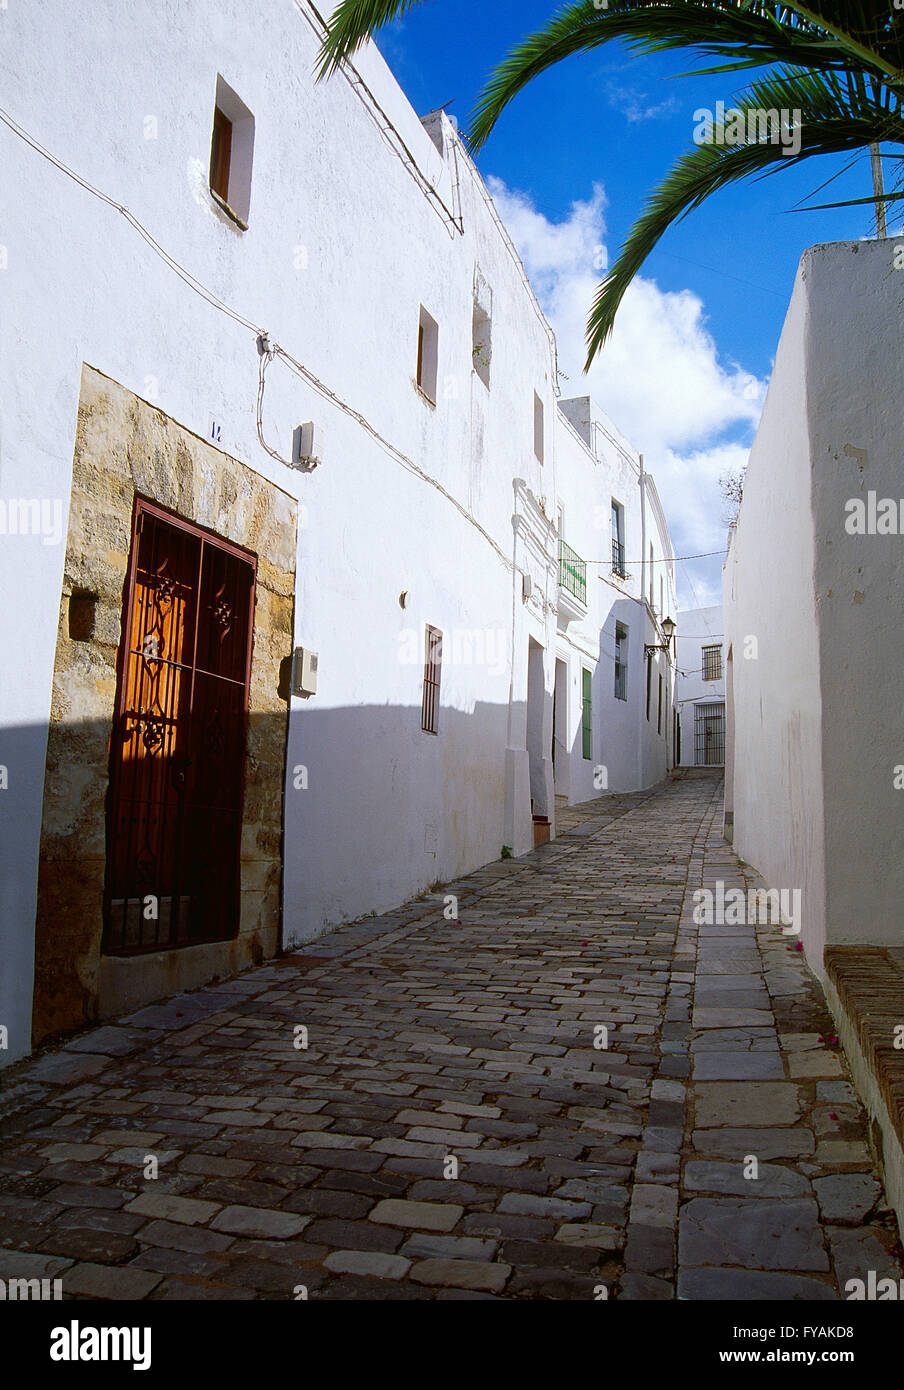 Street. Vejer de la Frontera, provincia de Cádiz, Andalucía, España. Imagen De Stock